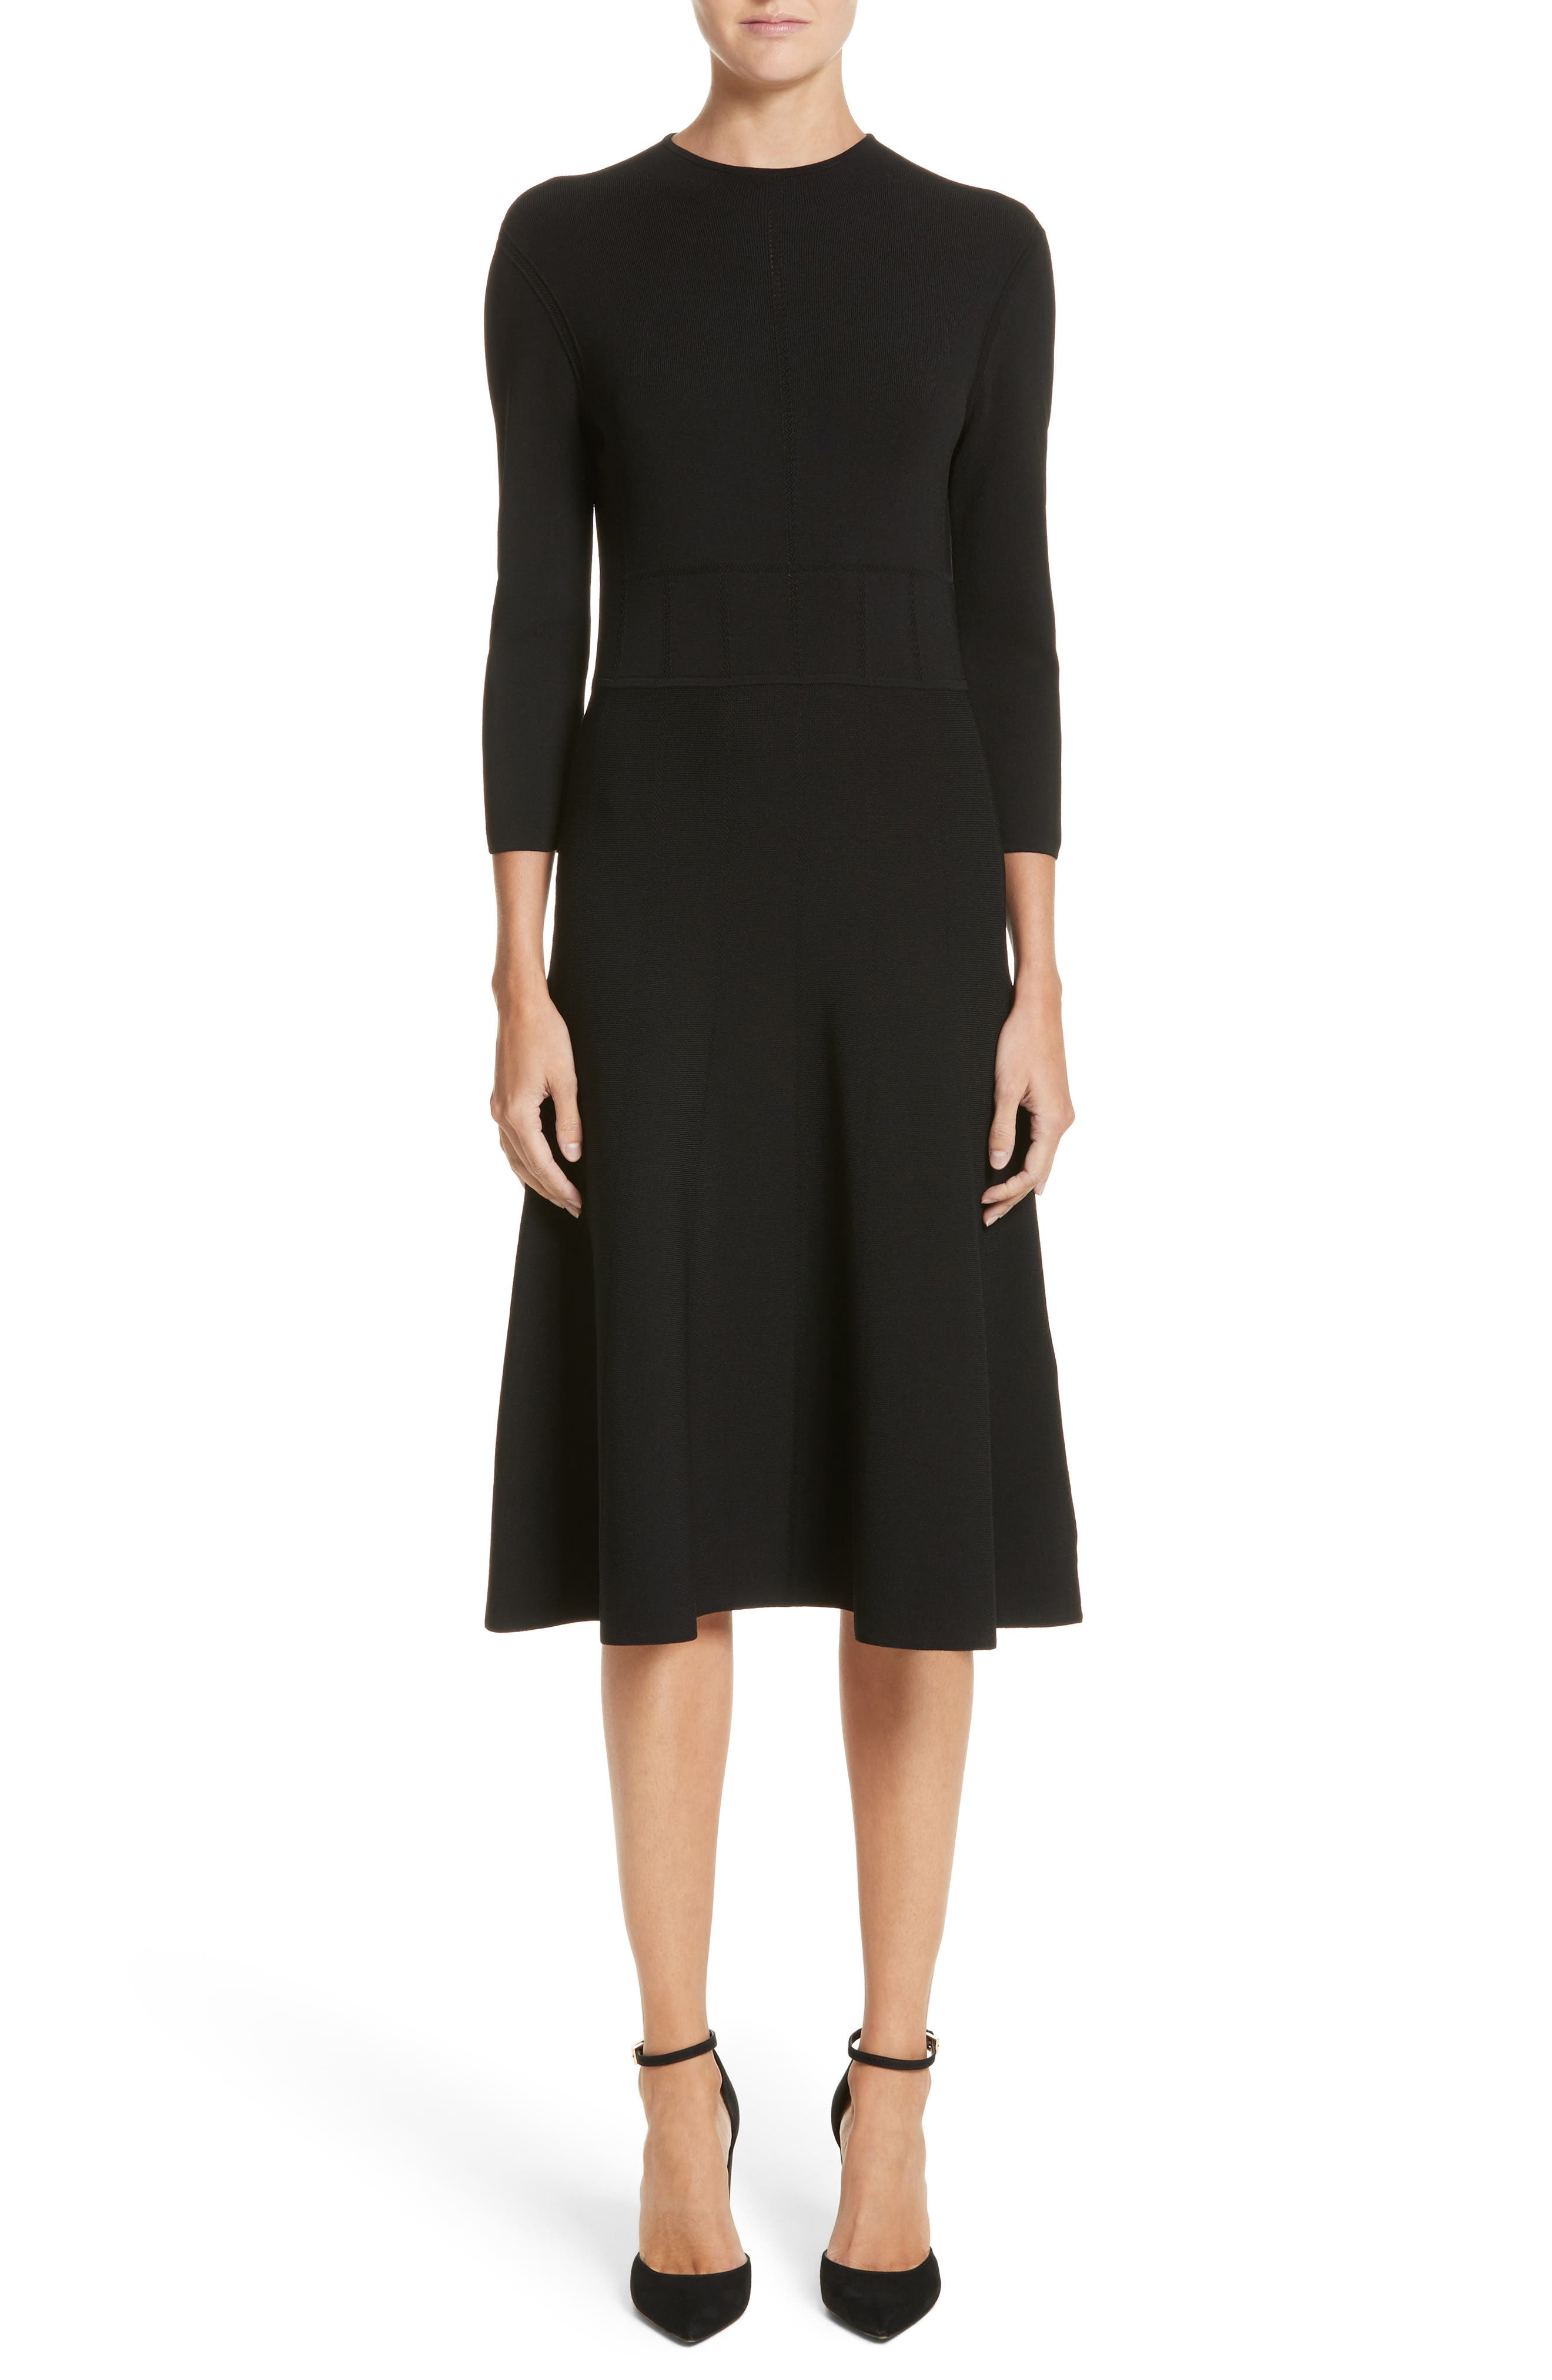 Emporio Armani High Neck Fit & Flare Dress